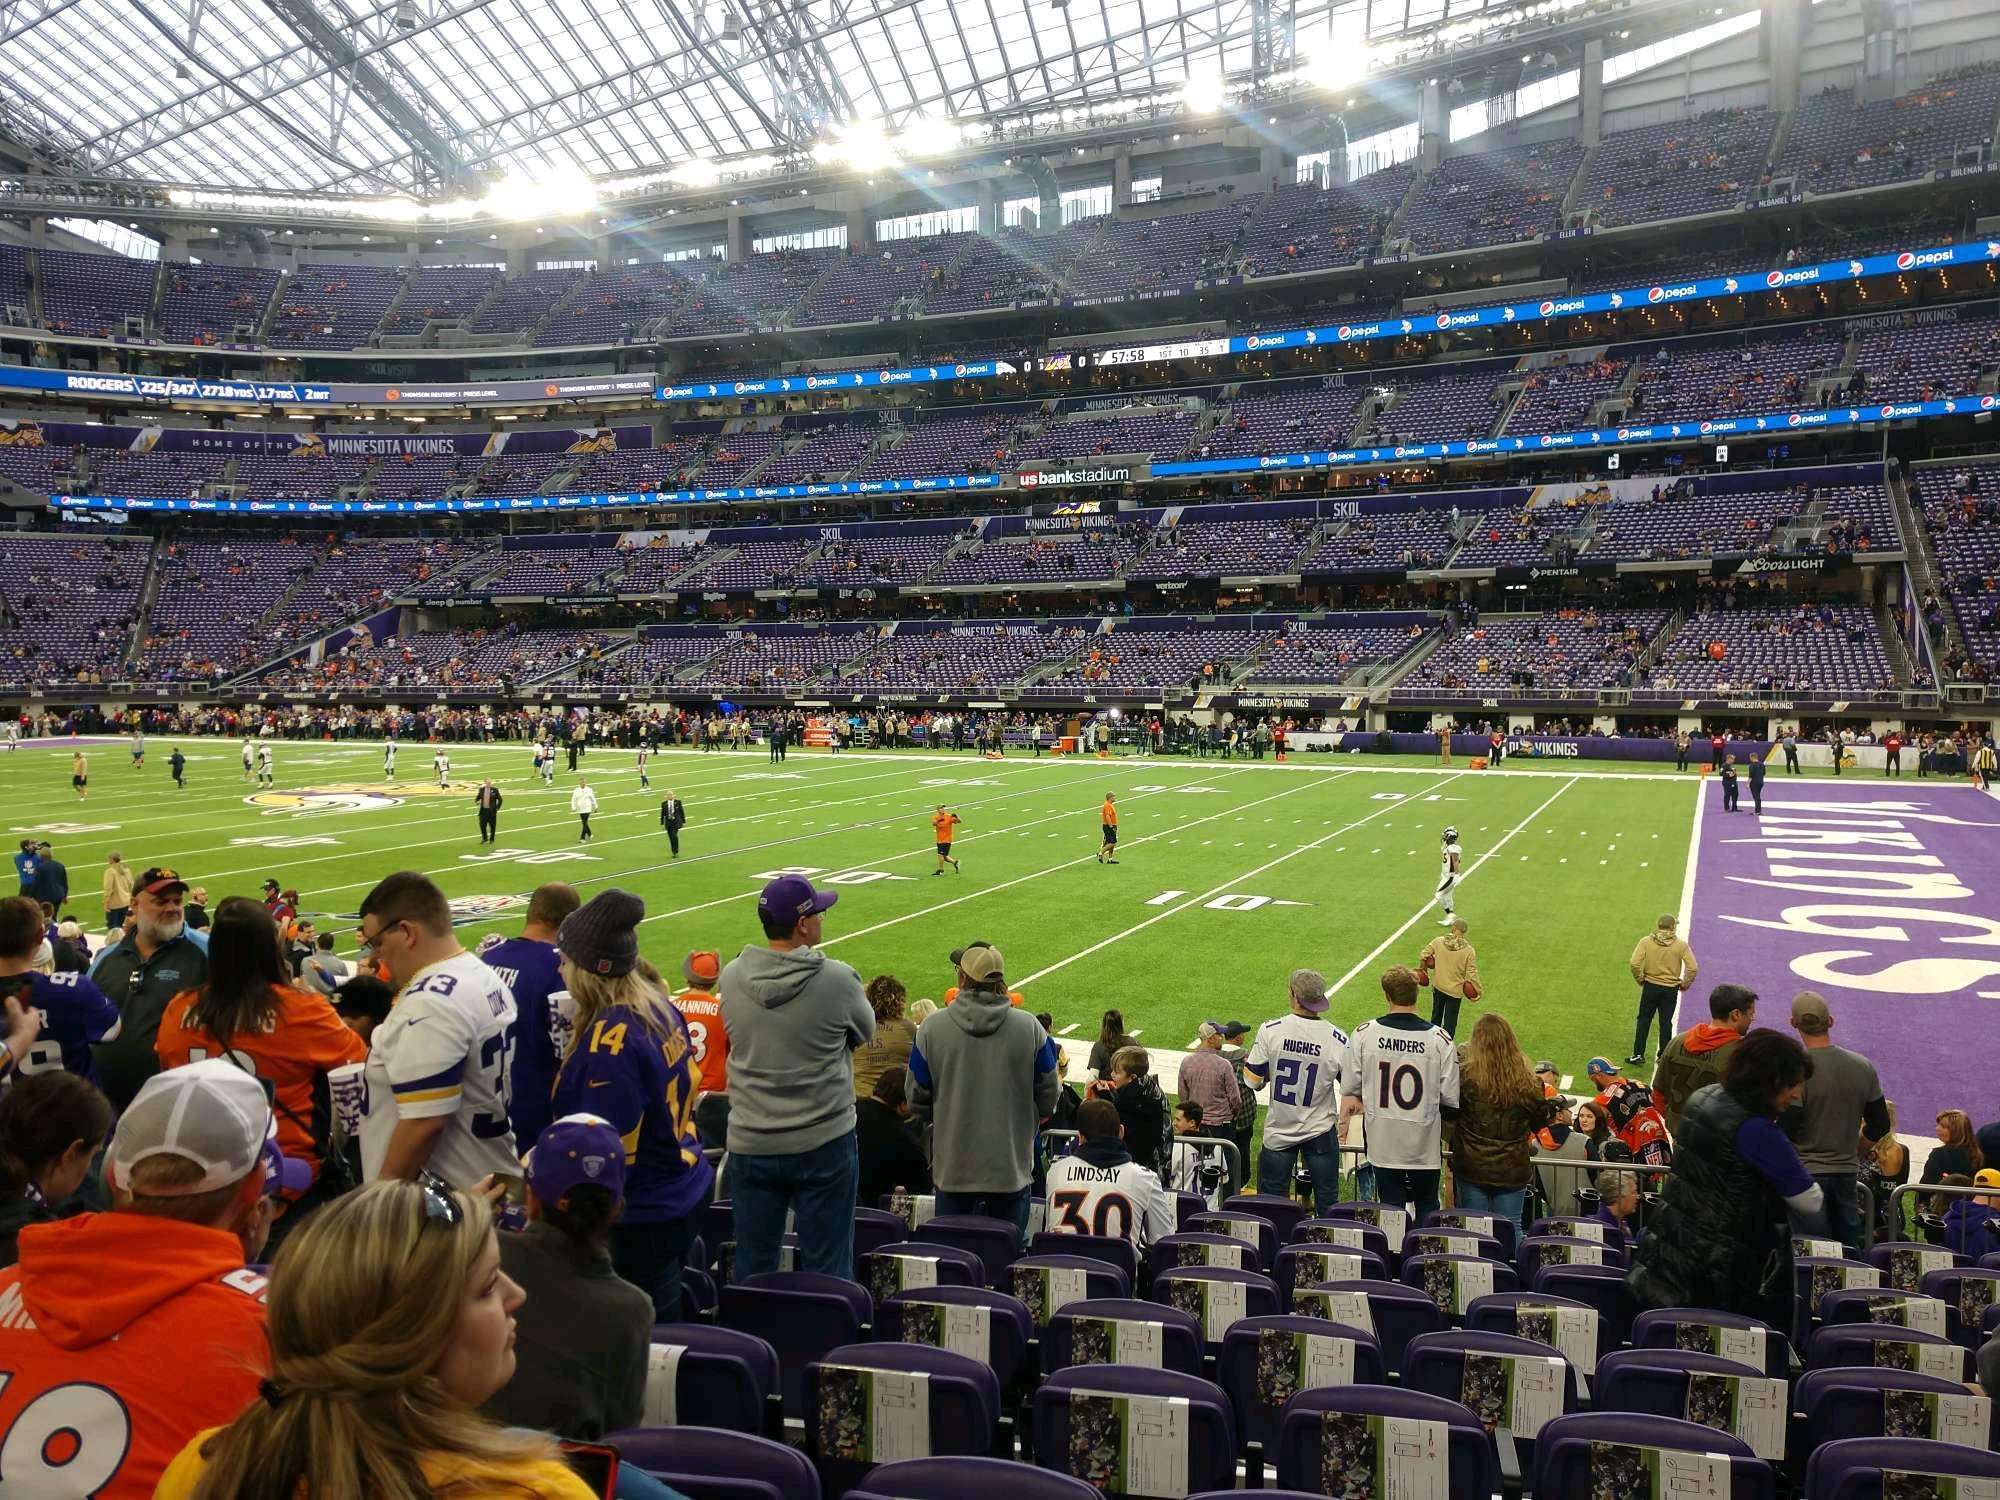 U.S. Bank Stadium Section 105 Row 10 Seat 15